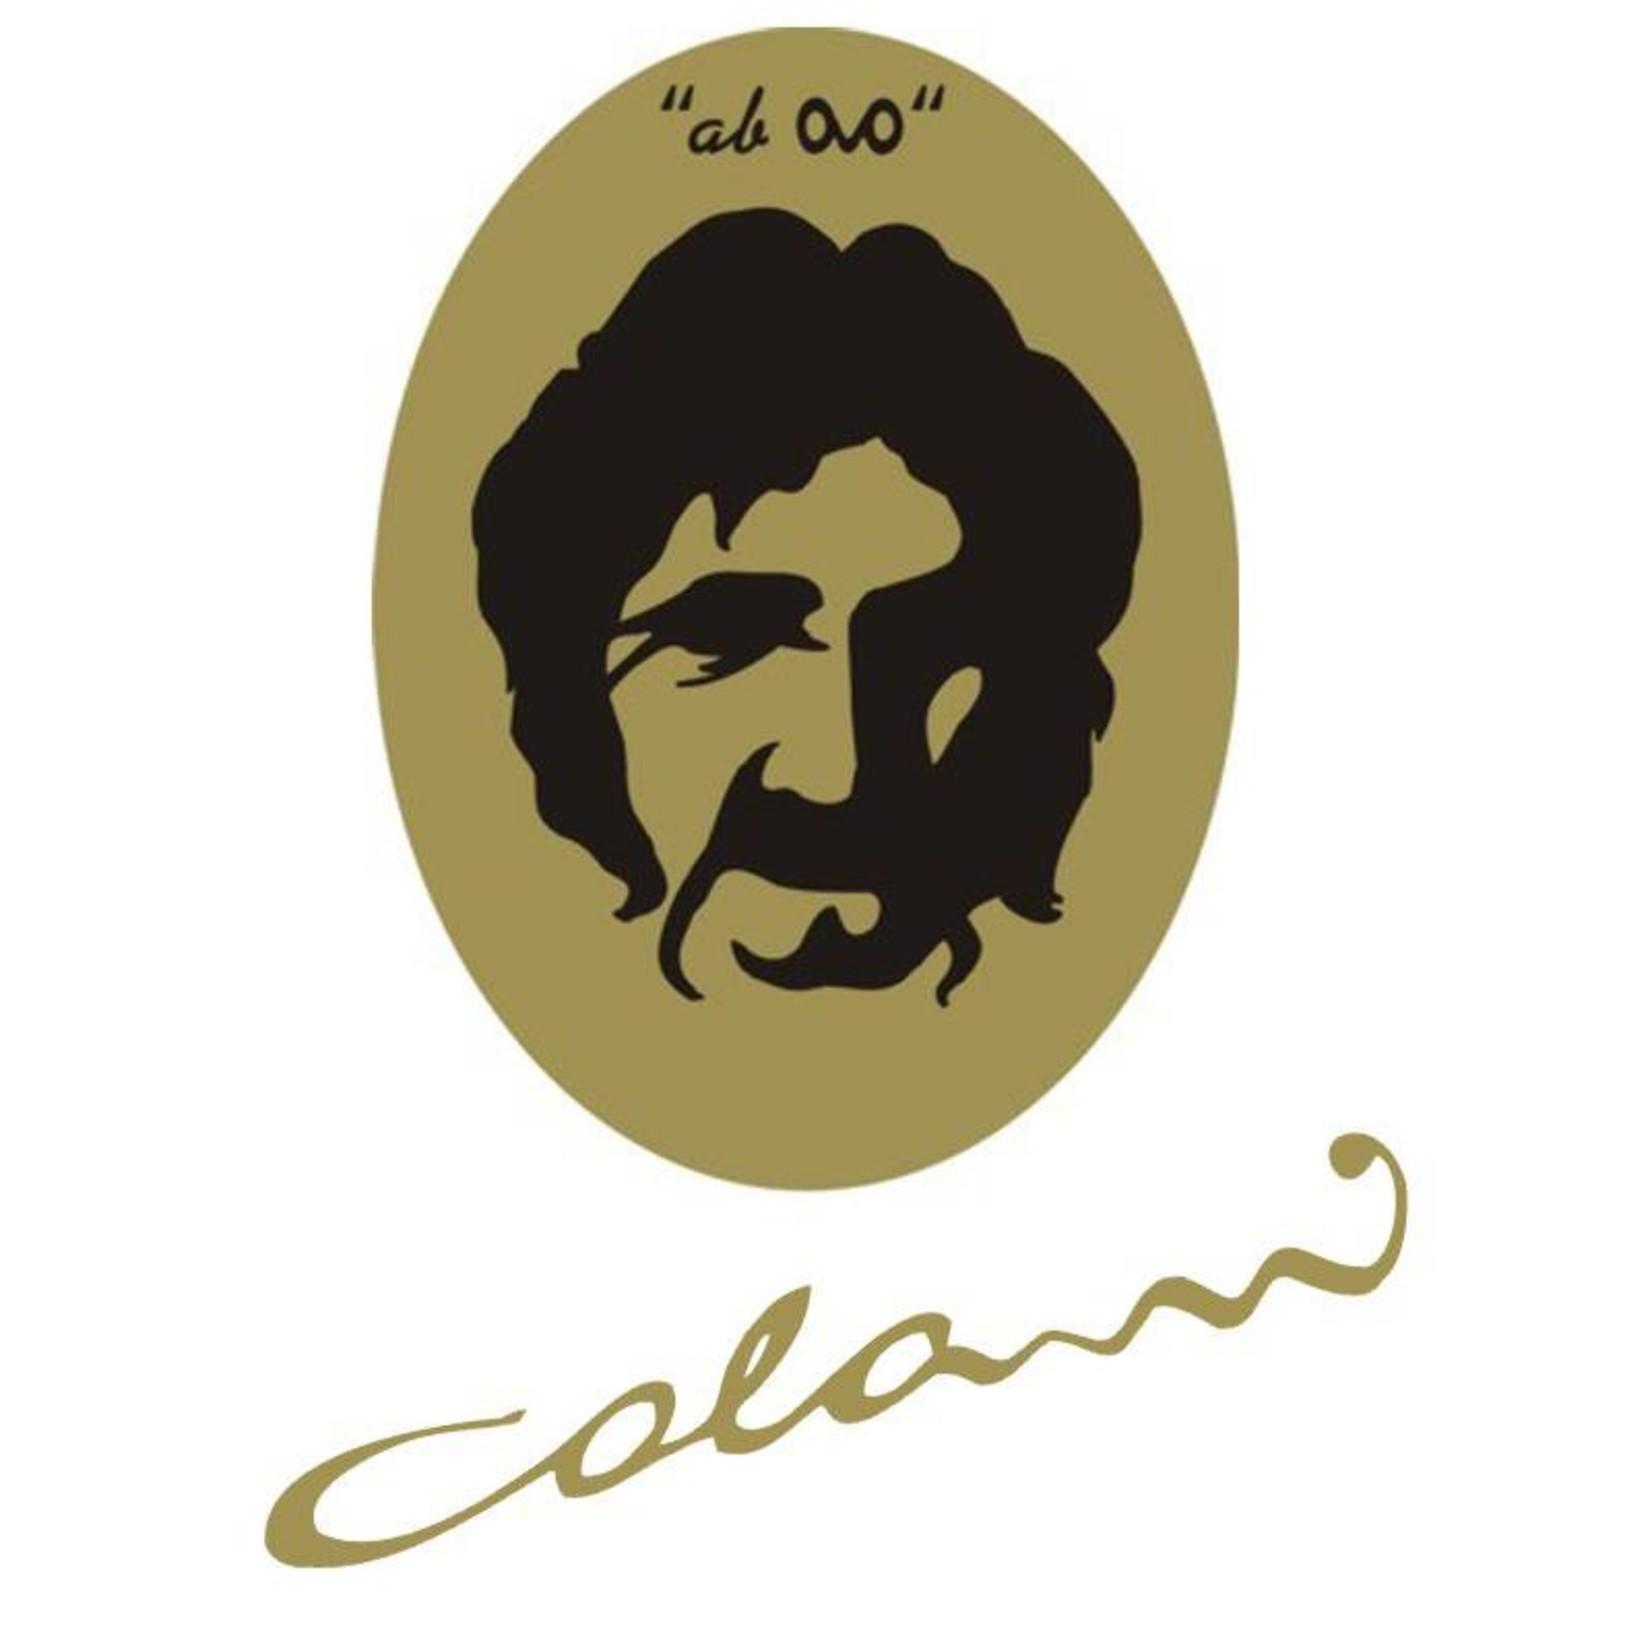 Colani Porzellanserie Colani Eierbecher | weiß | Porzellan | Luigi Colani Design